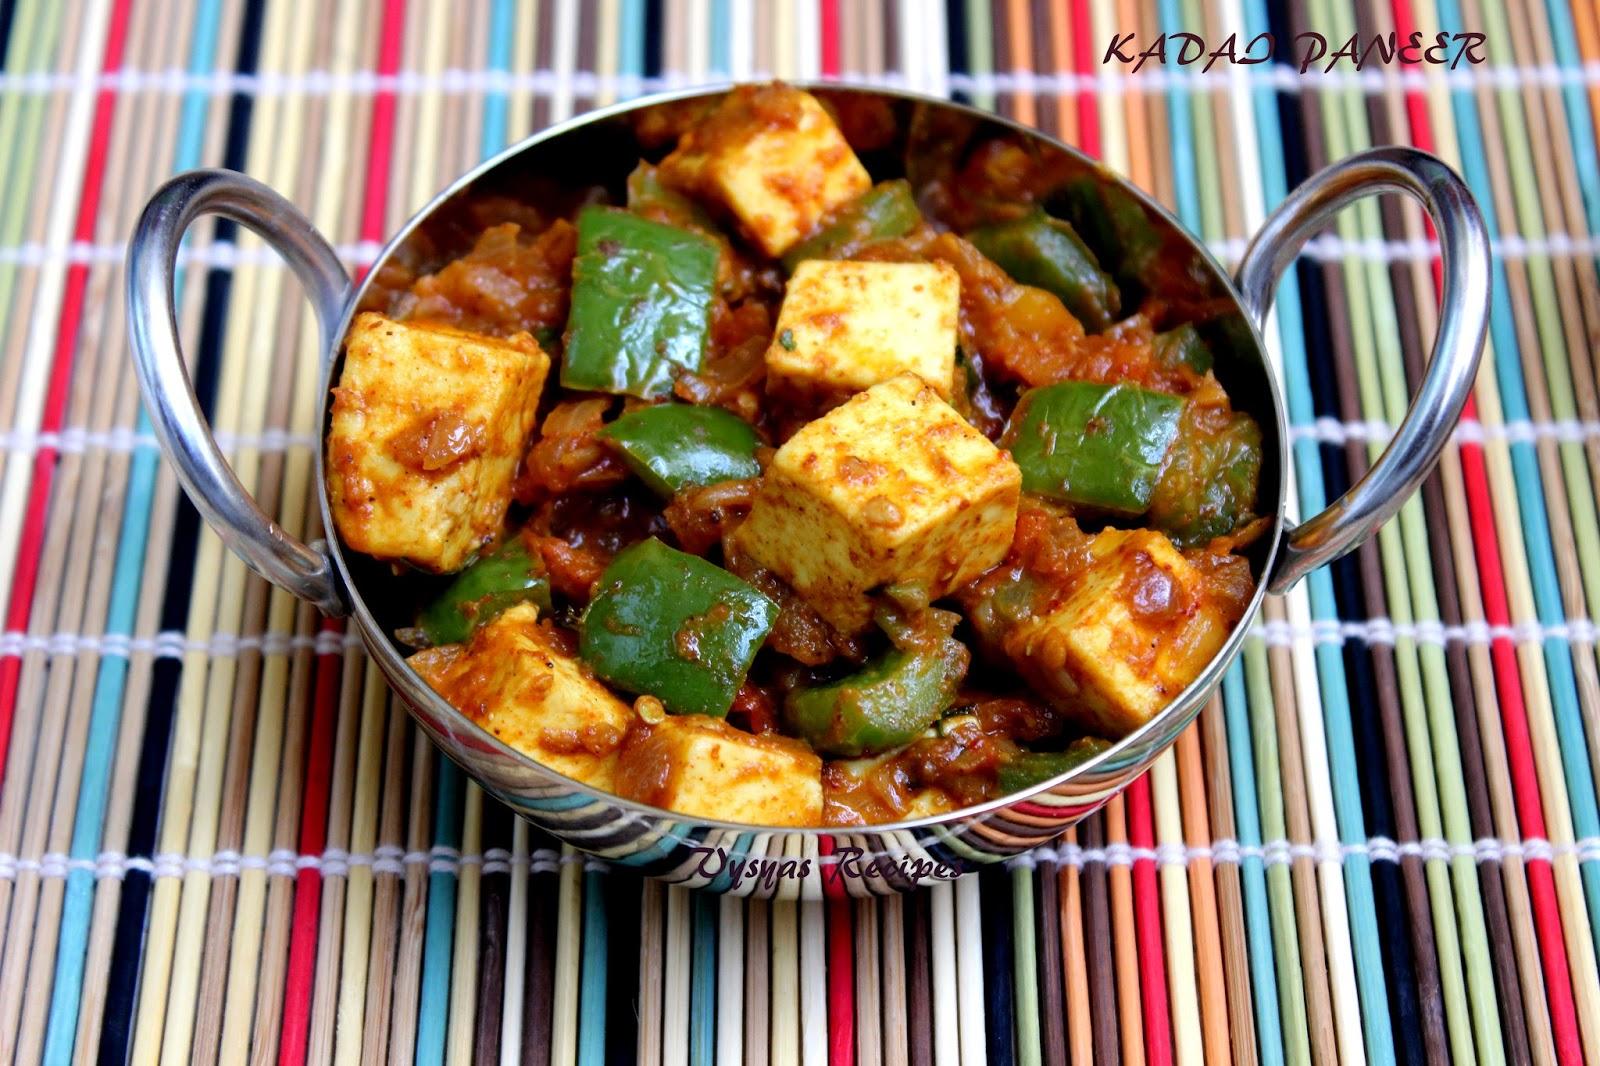 Vysyas delicious recipes kadai paneer kadai paneer forumfinder Gallery